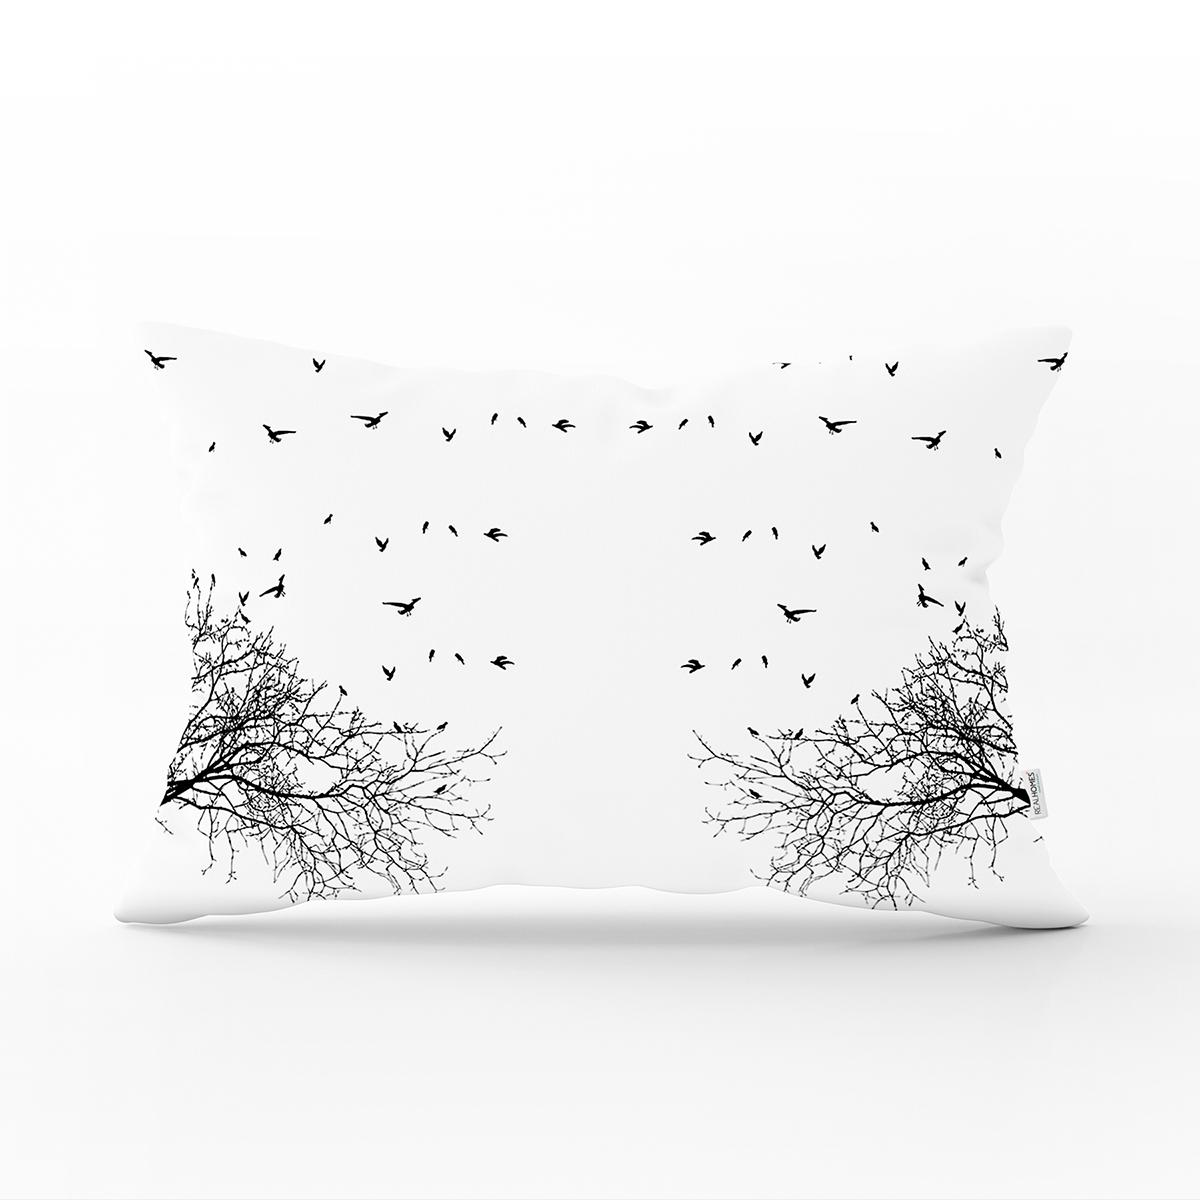 Realhomes Ağaç Dalı Kuş Tasarımlı Dijital Baskılı Dikdörtgen Kırlent Kılıfı Realhomes